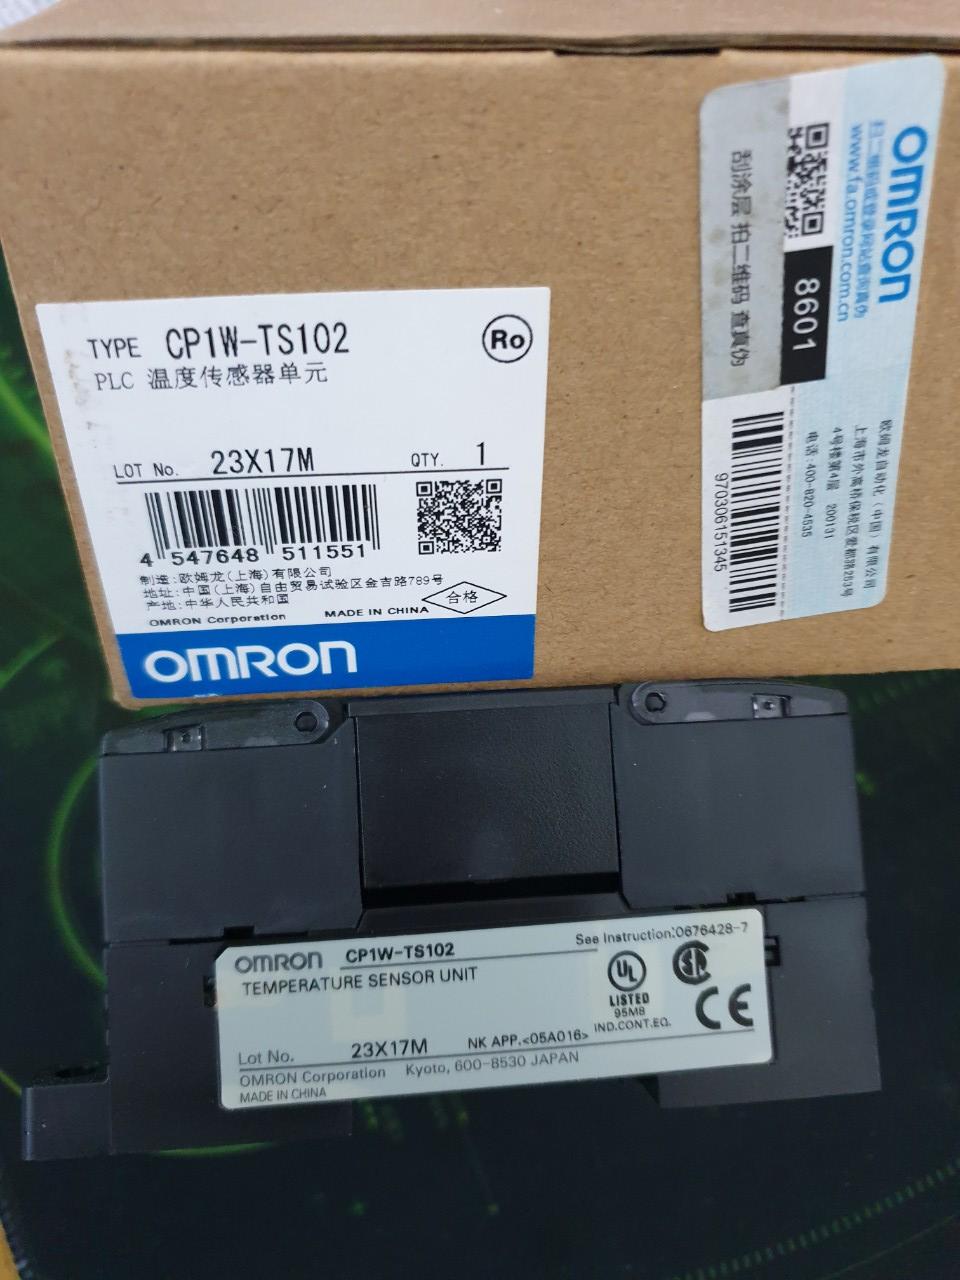 OMRON CP1W-TS102